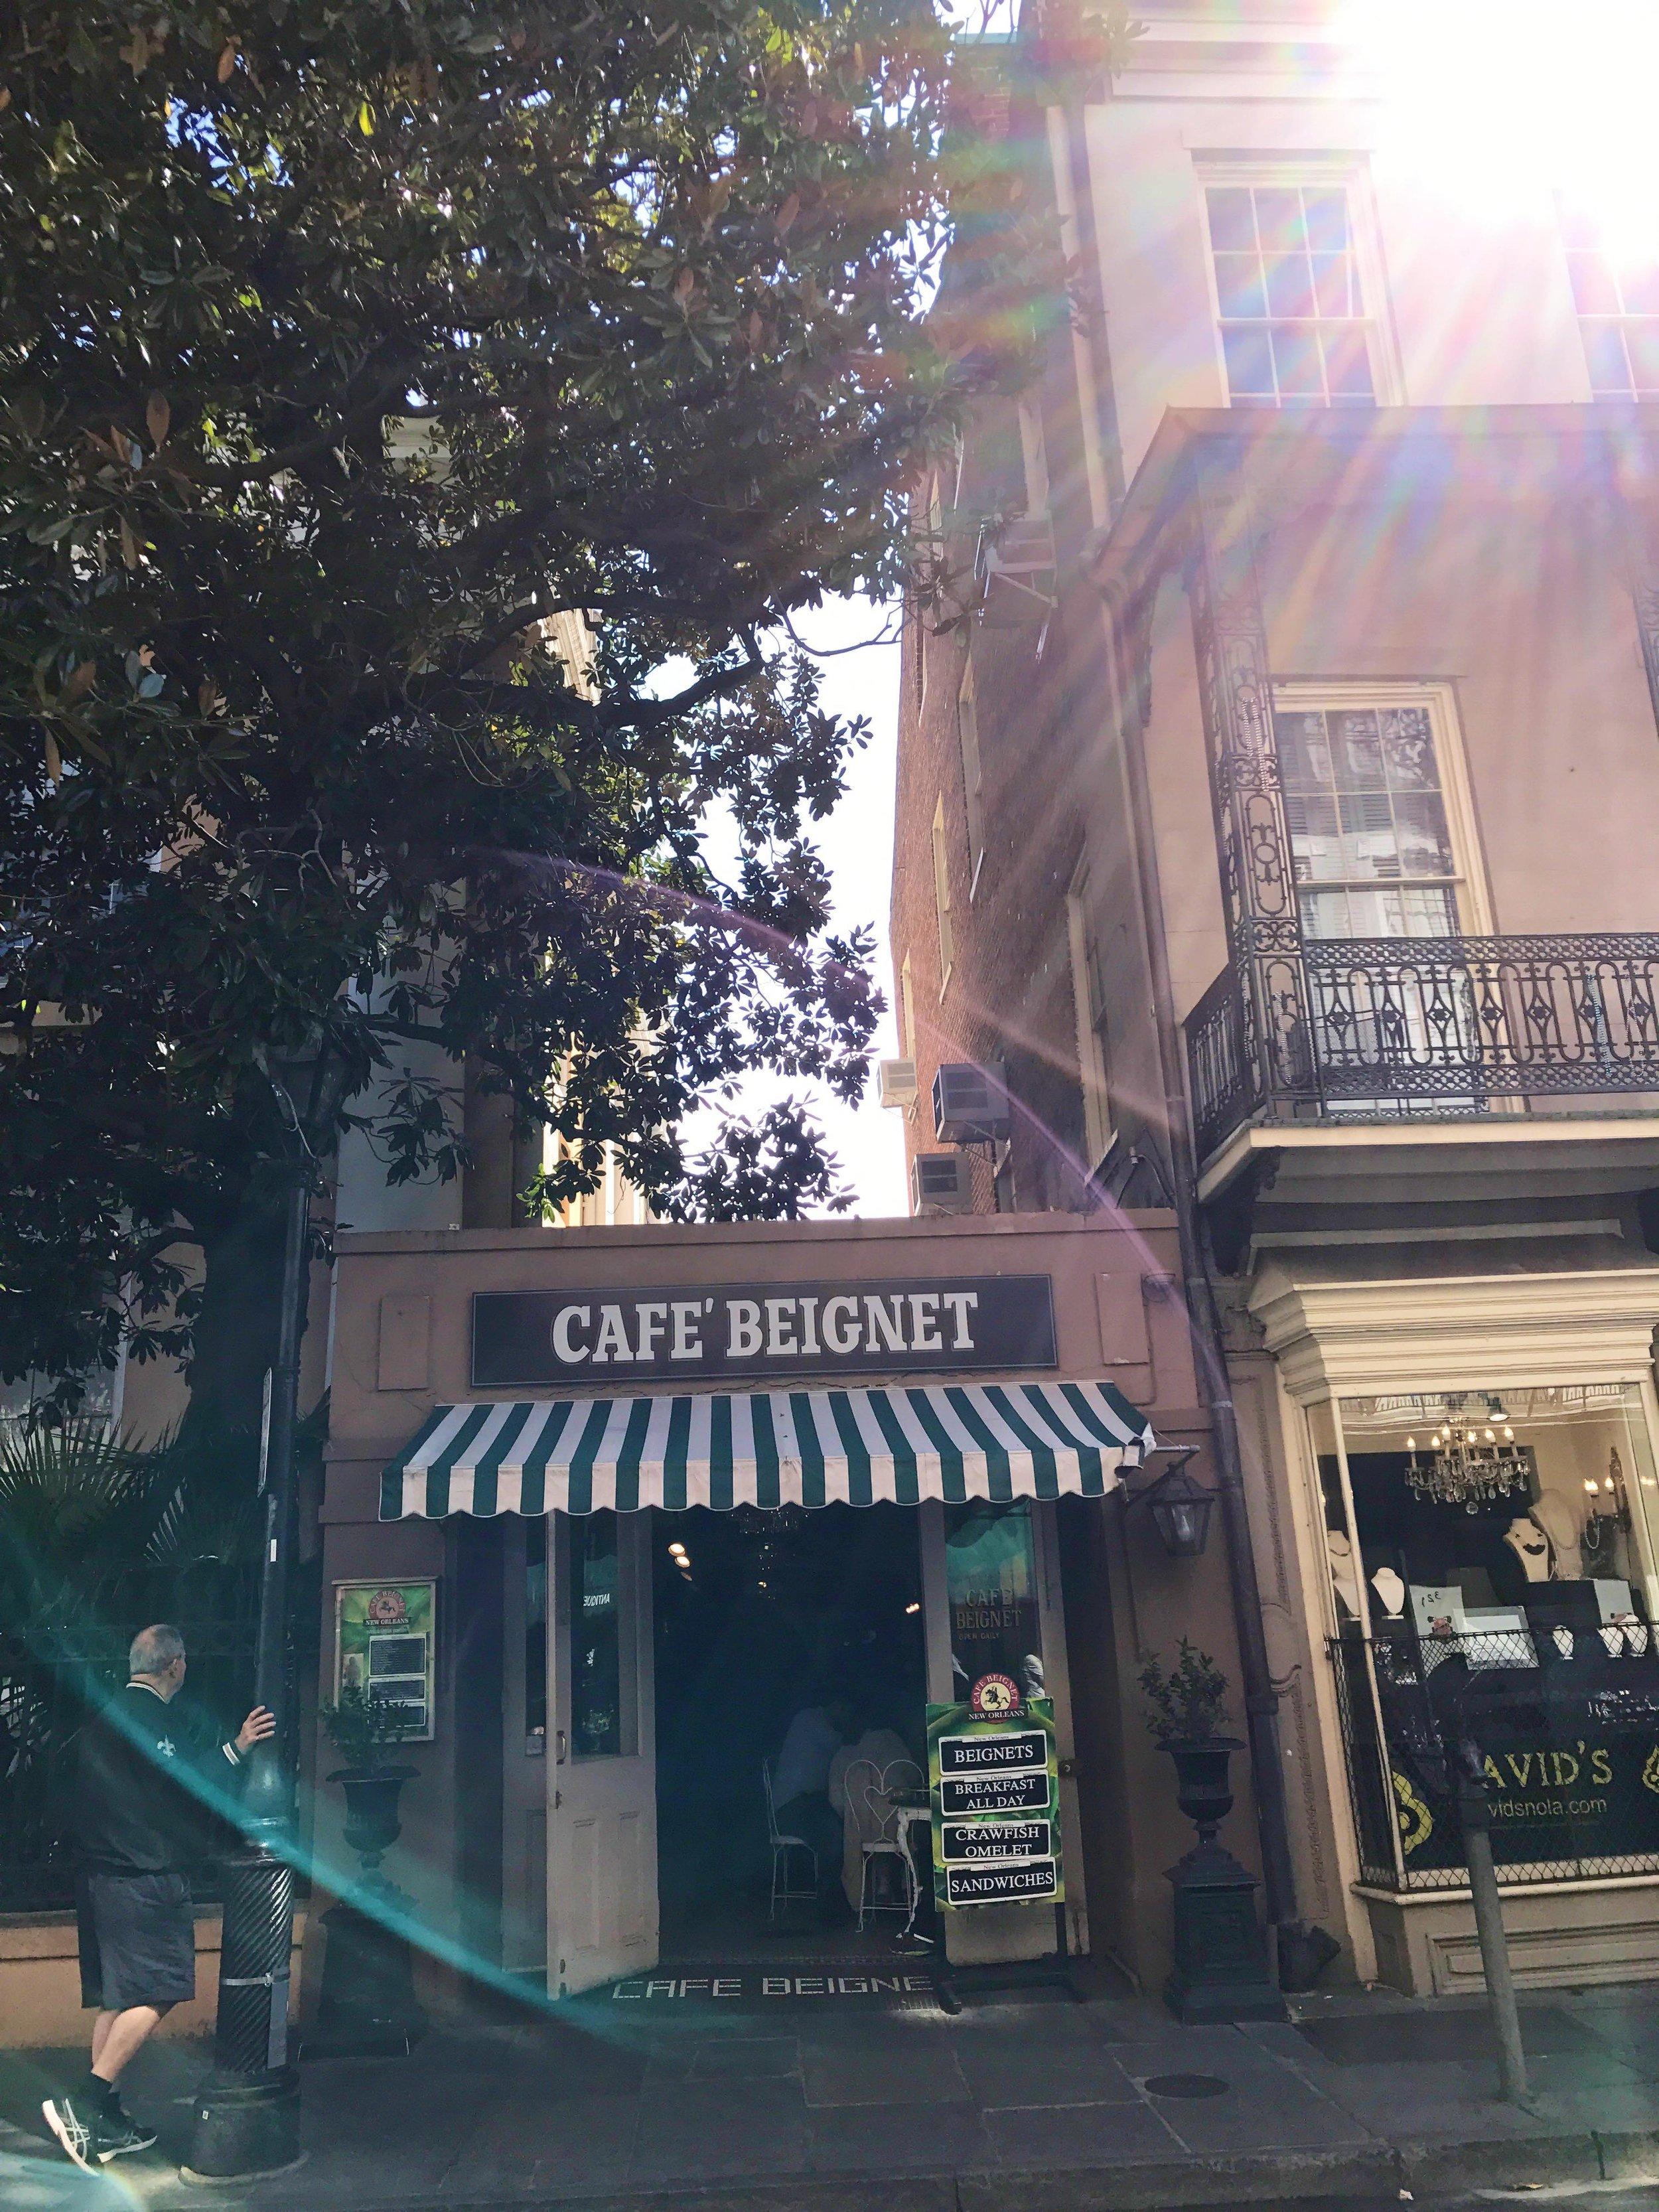 The Royal Street Cafe Beignet